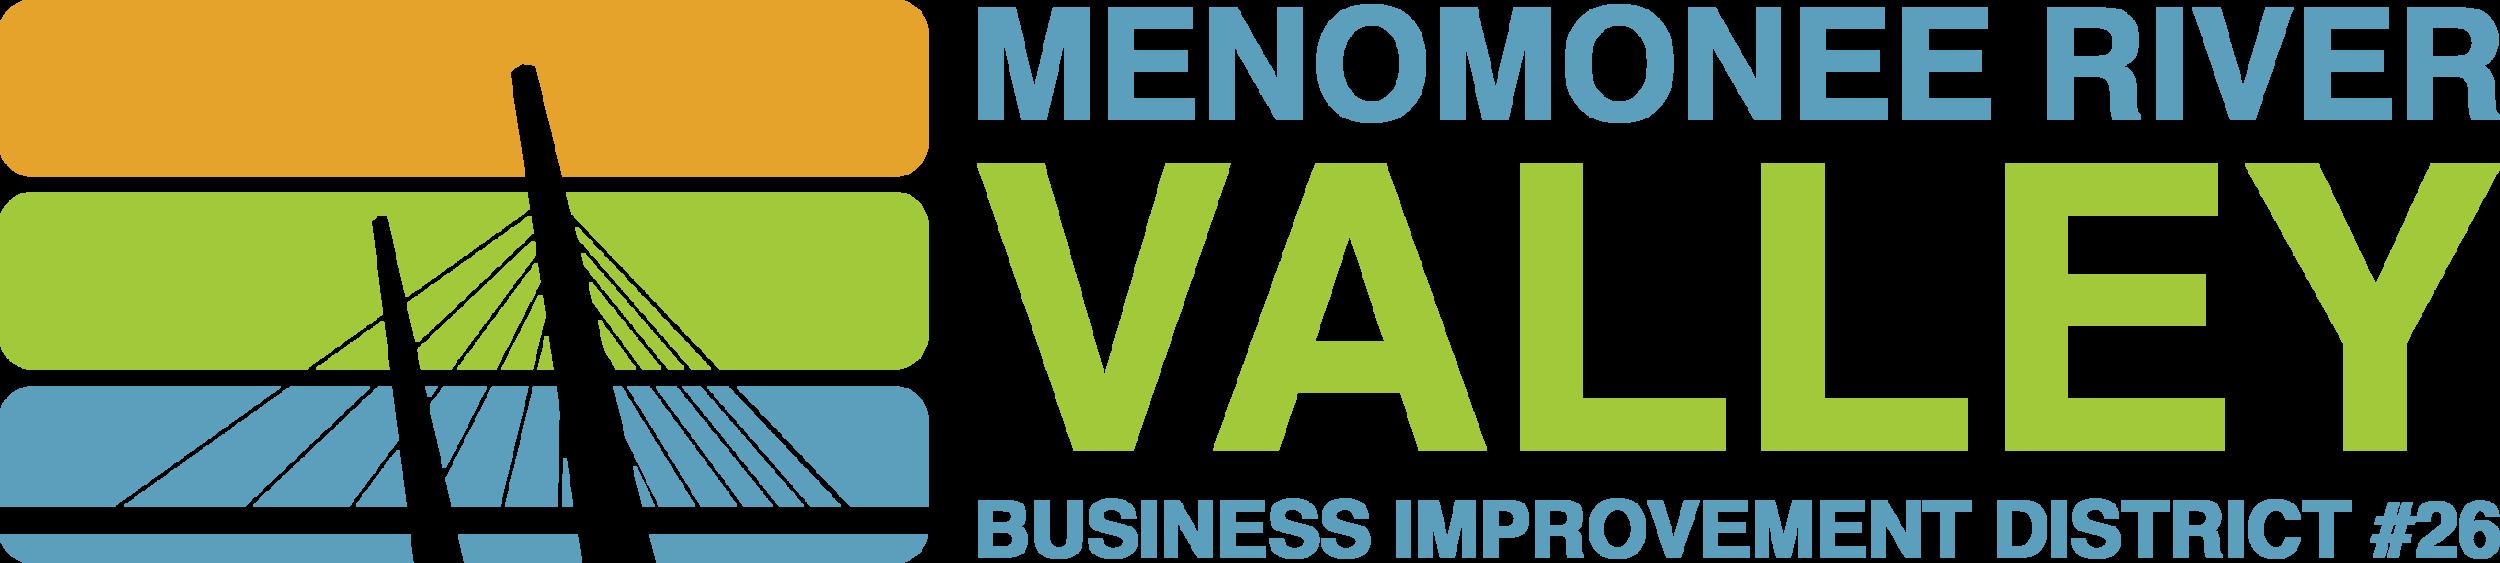 MenomoneeRiverValley_BusinessImprovementDistrict_Logo_Horizontal.png